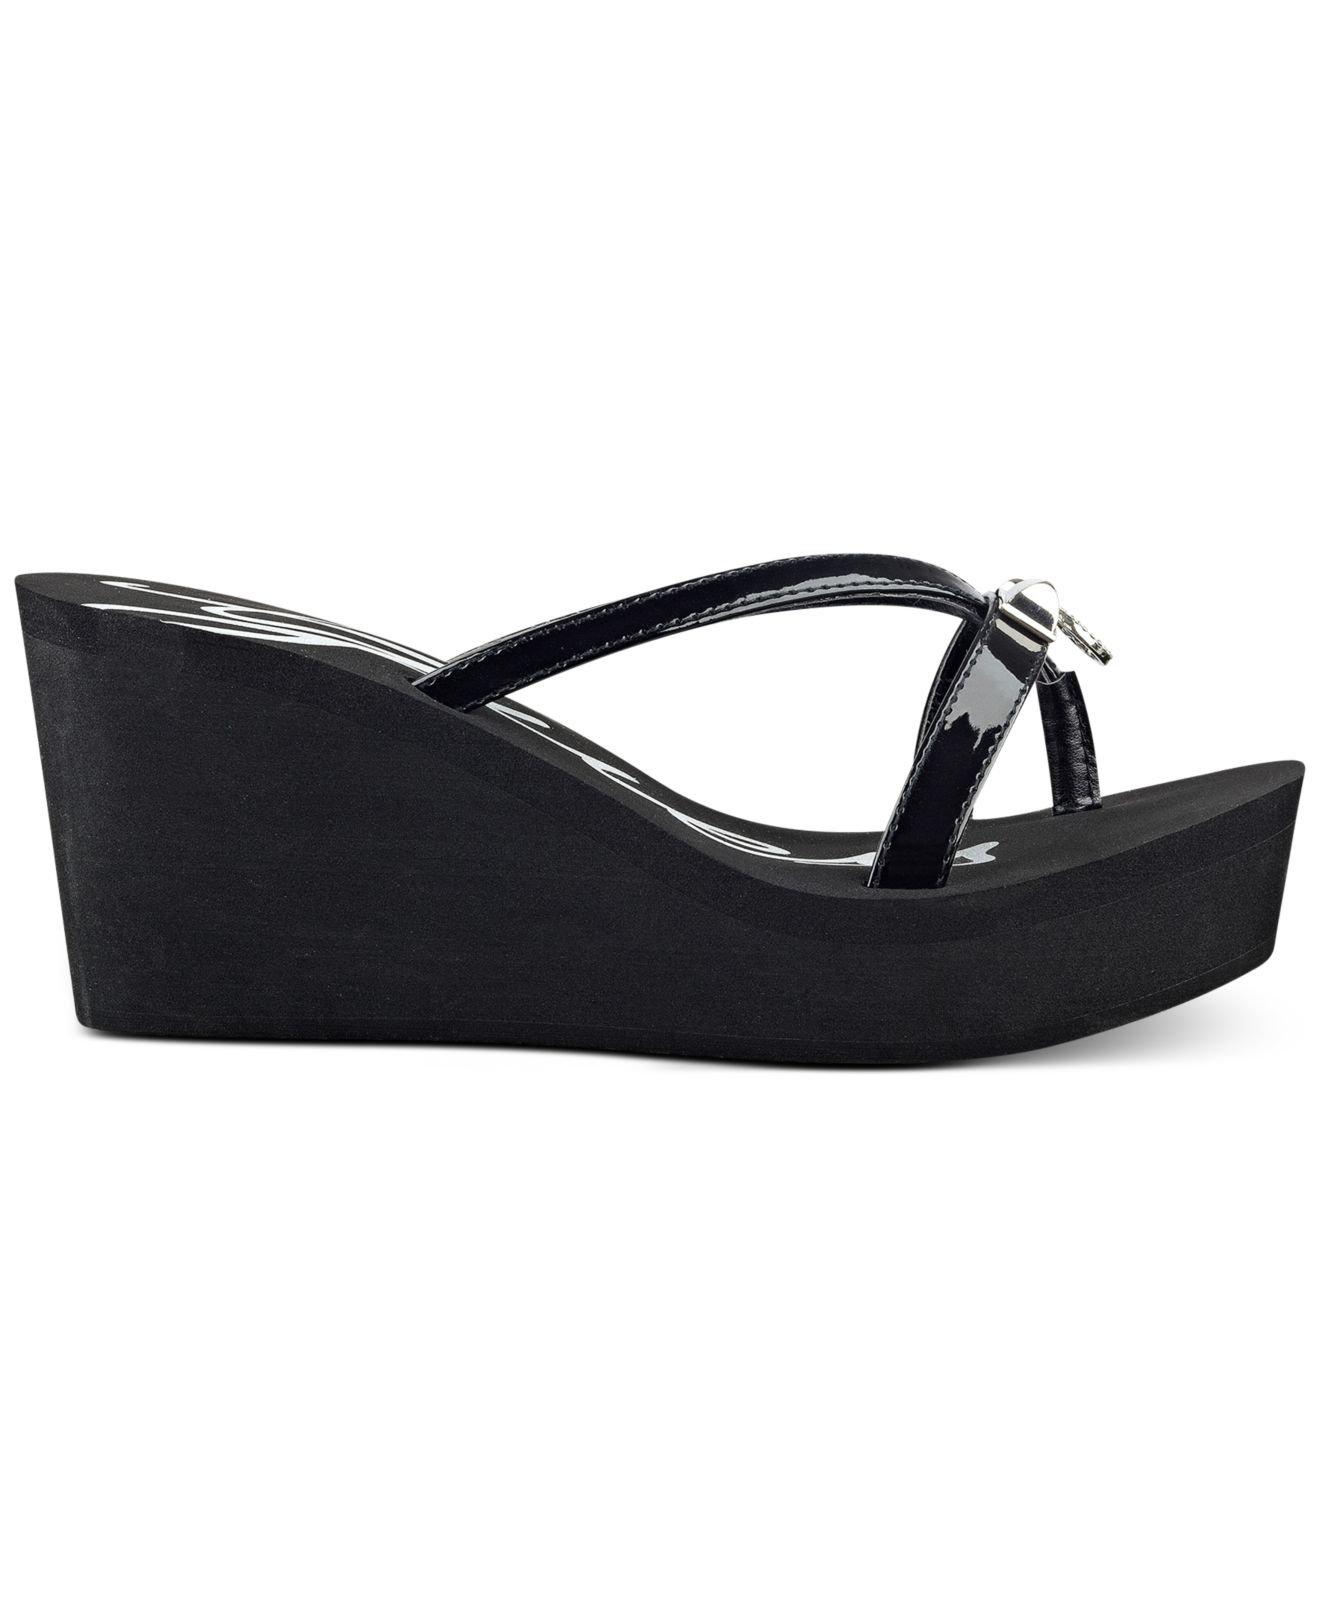 10295f73266d0 Lyst - Guess Women s Shea Platform Wedge Flip-flop Sandals in Black